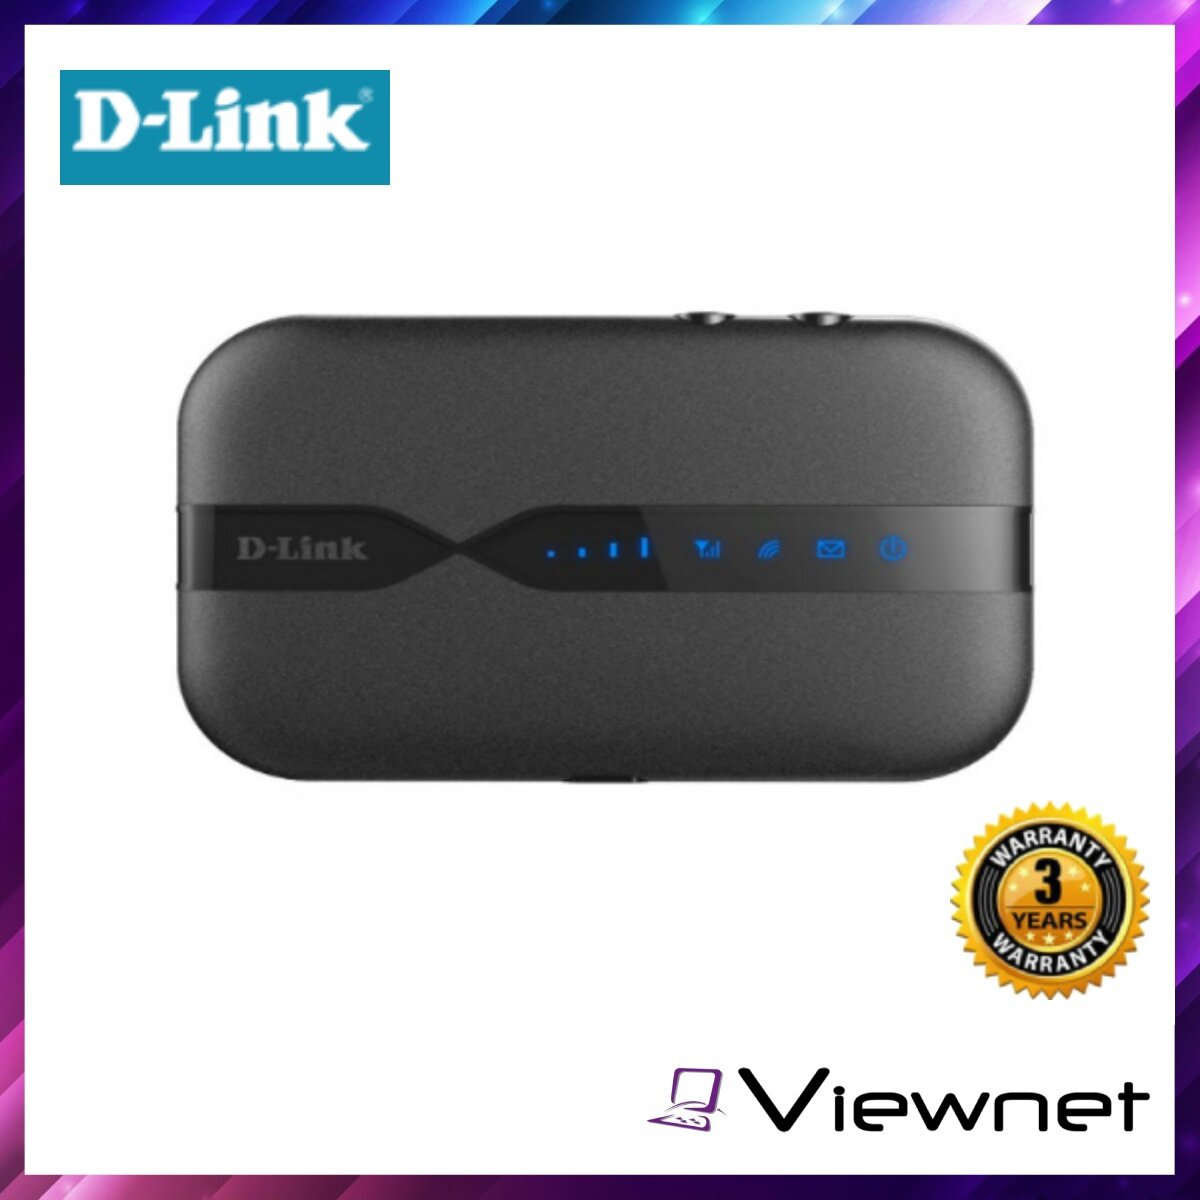 D-Link Portable WiFi Modem Router (DWR-932C-E1) N300 4G LTE, Micro USB port, Micro SD slot for 32GB (DWR-932C E1)